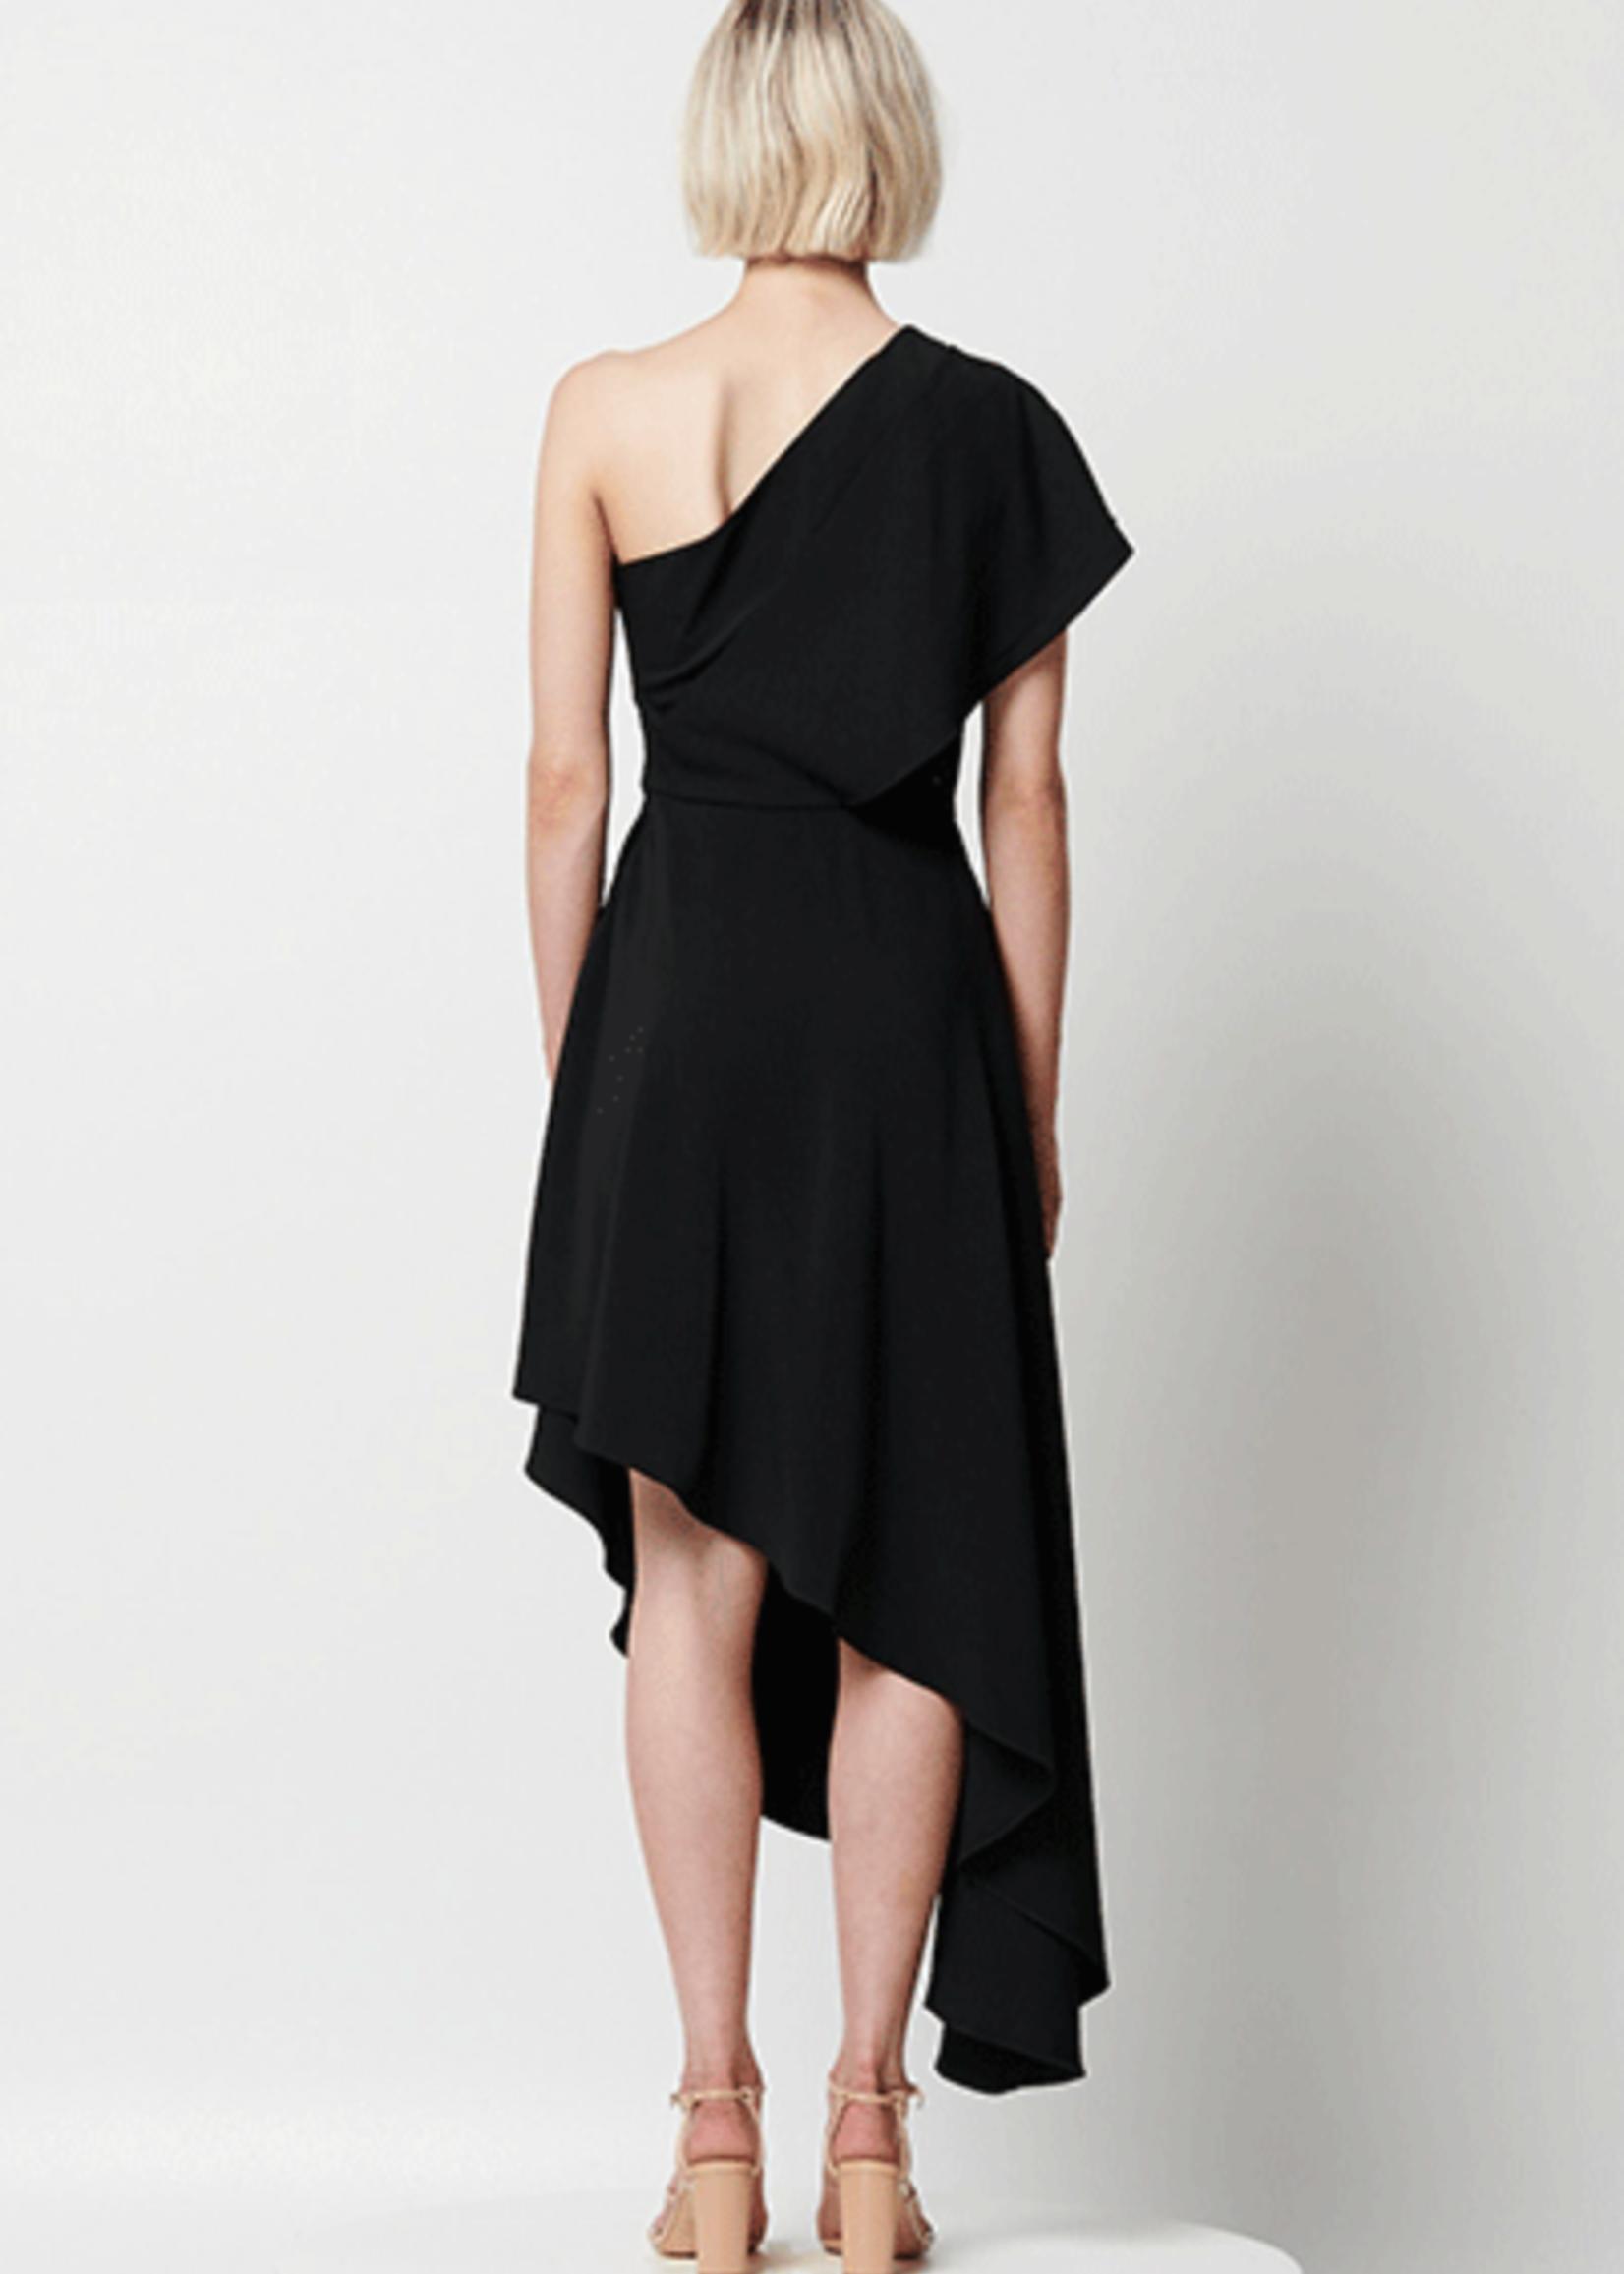 Elitaire Boutique Alpinia Dress in Black